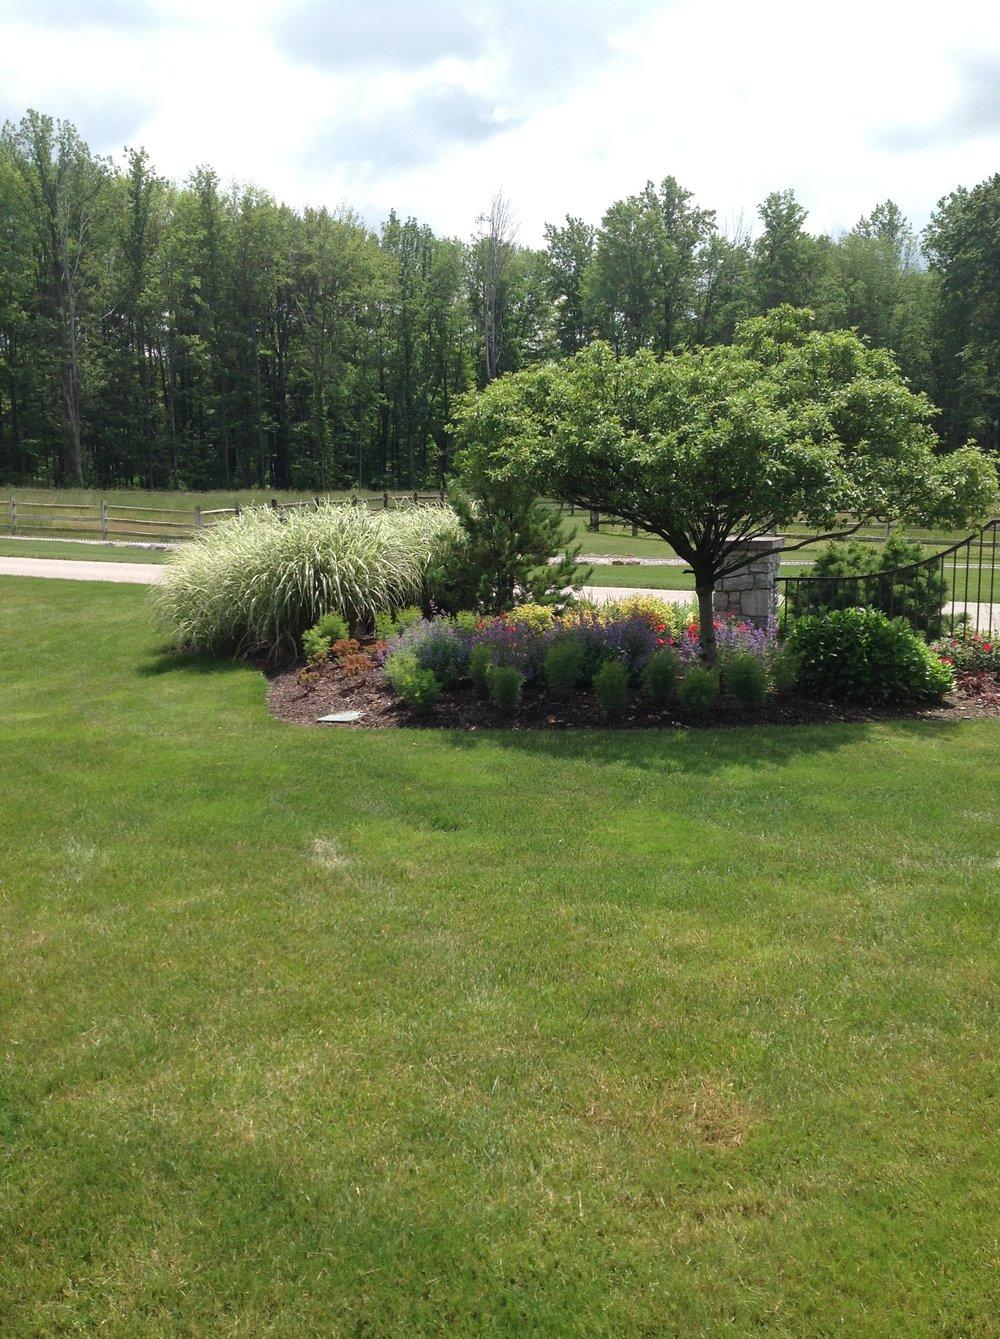 Unilock landscaping companies with top lawn fertilzer in Bainbridge Township, OH